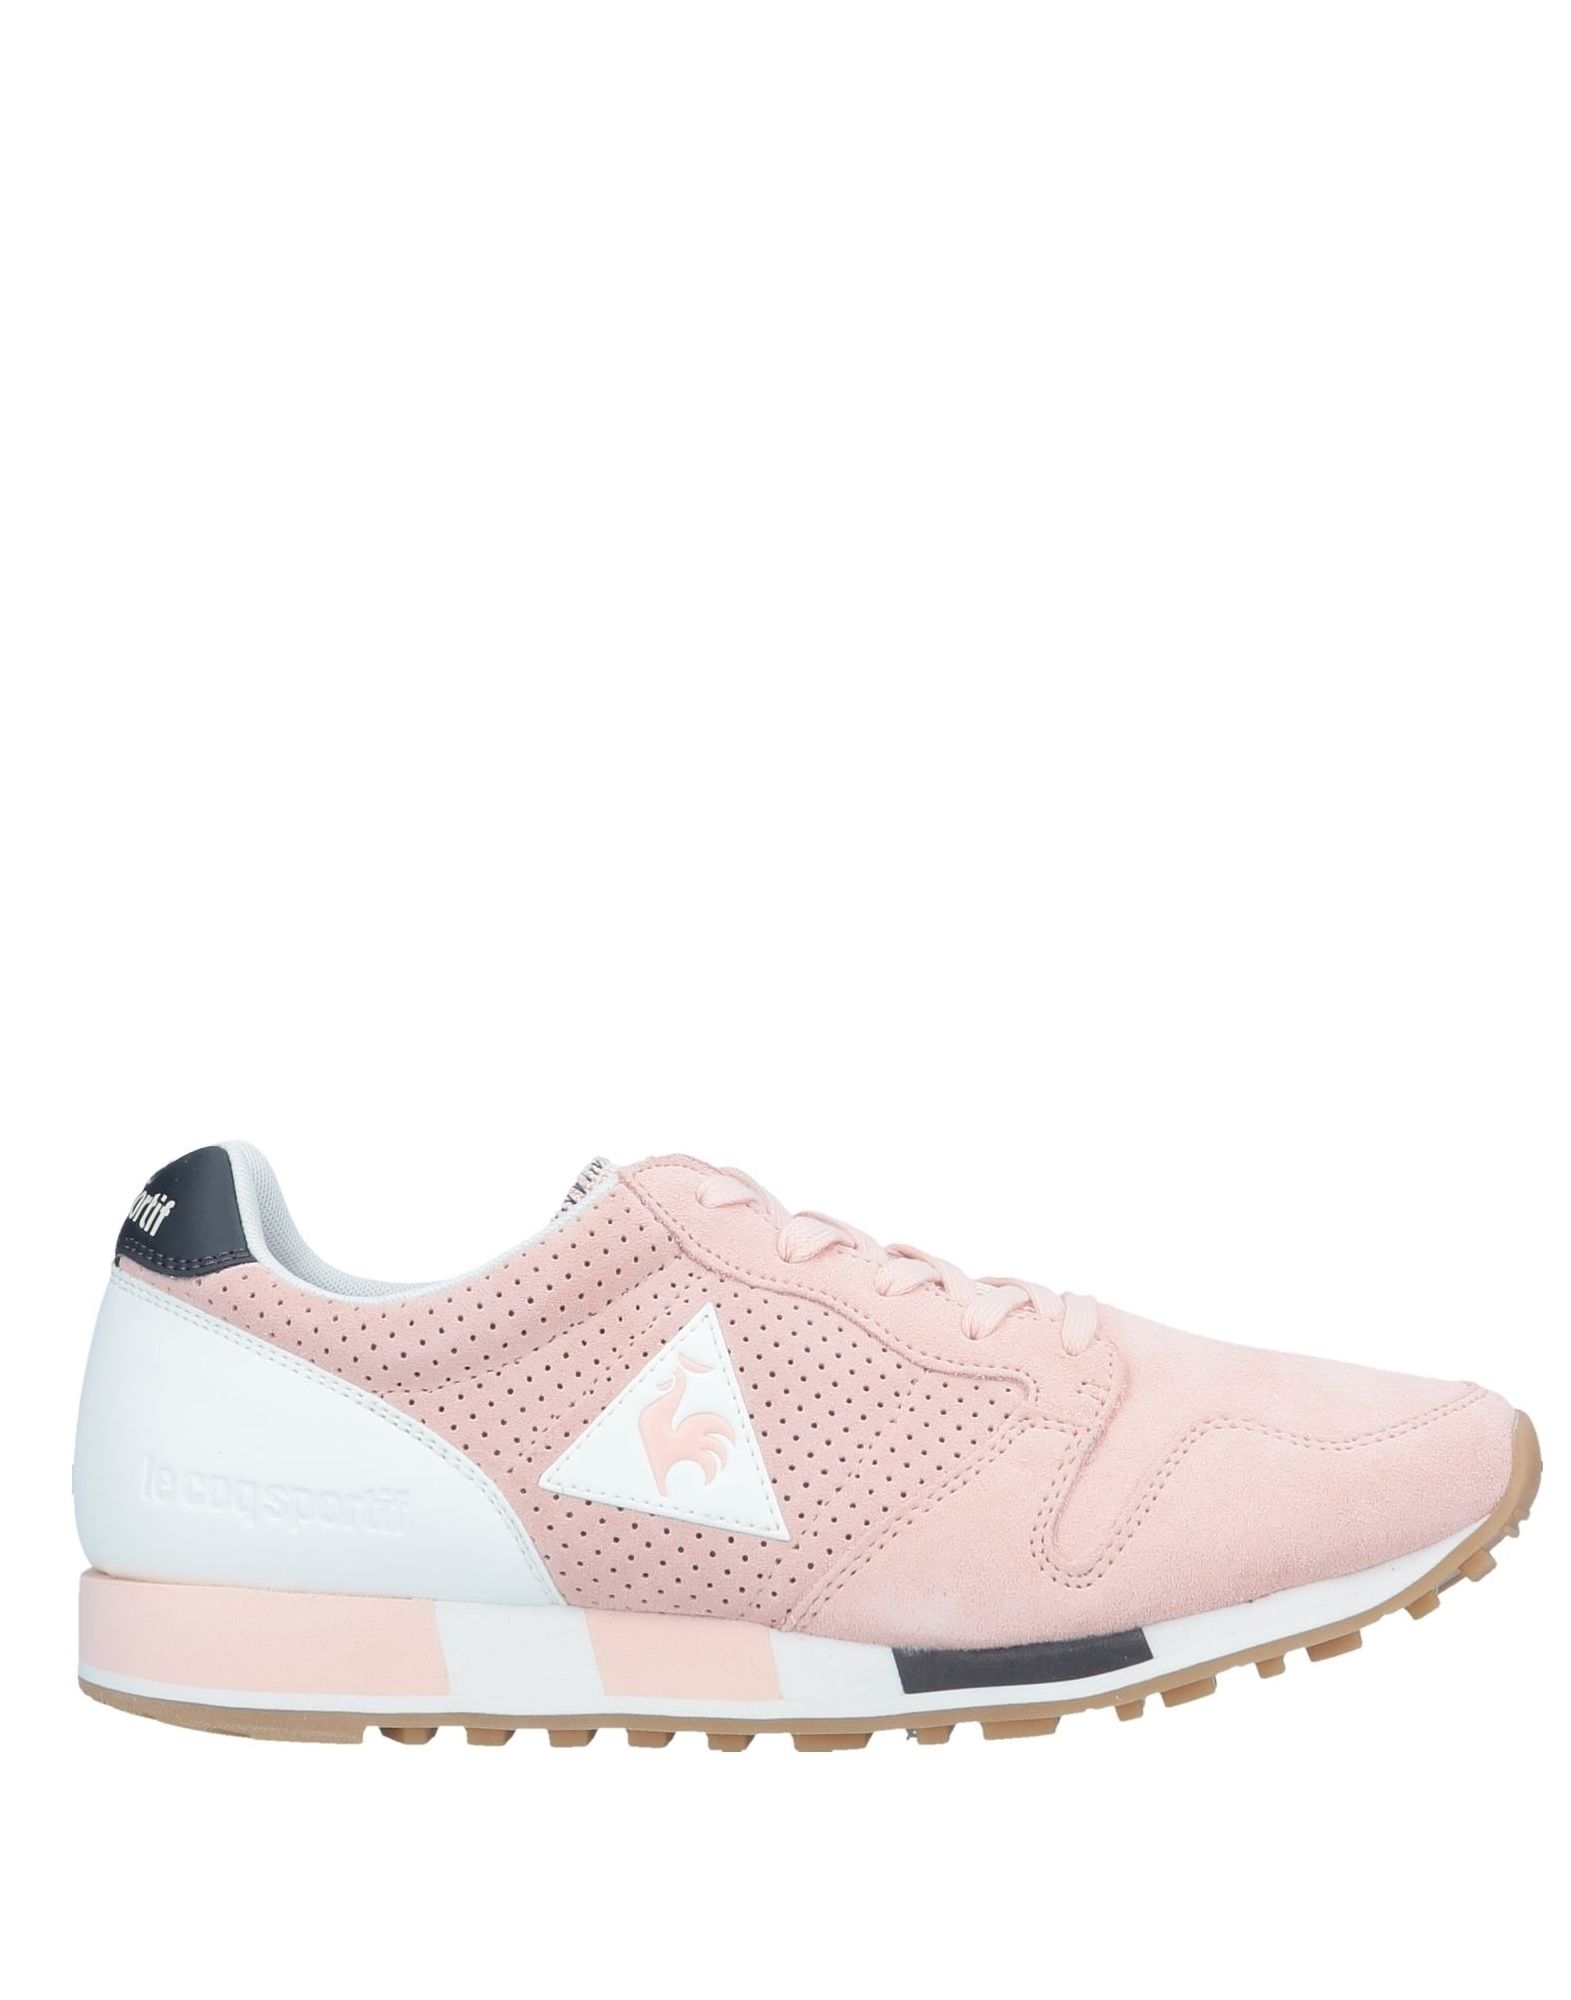 Le Coq Sportif Sneakers Sneakers